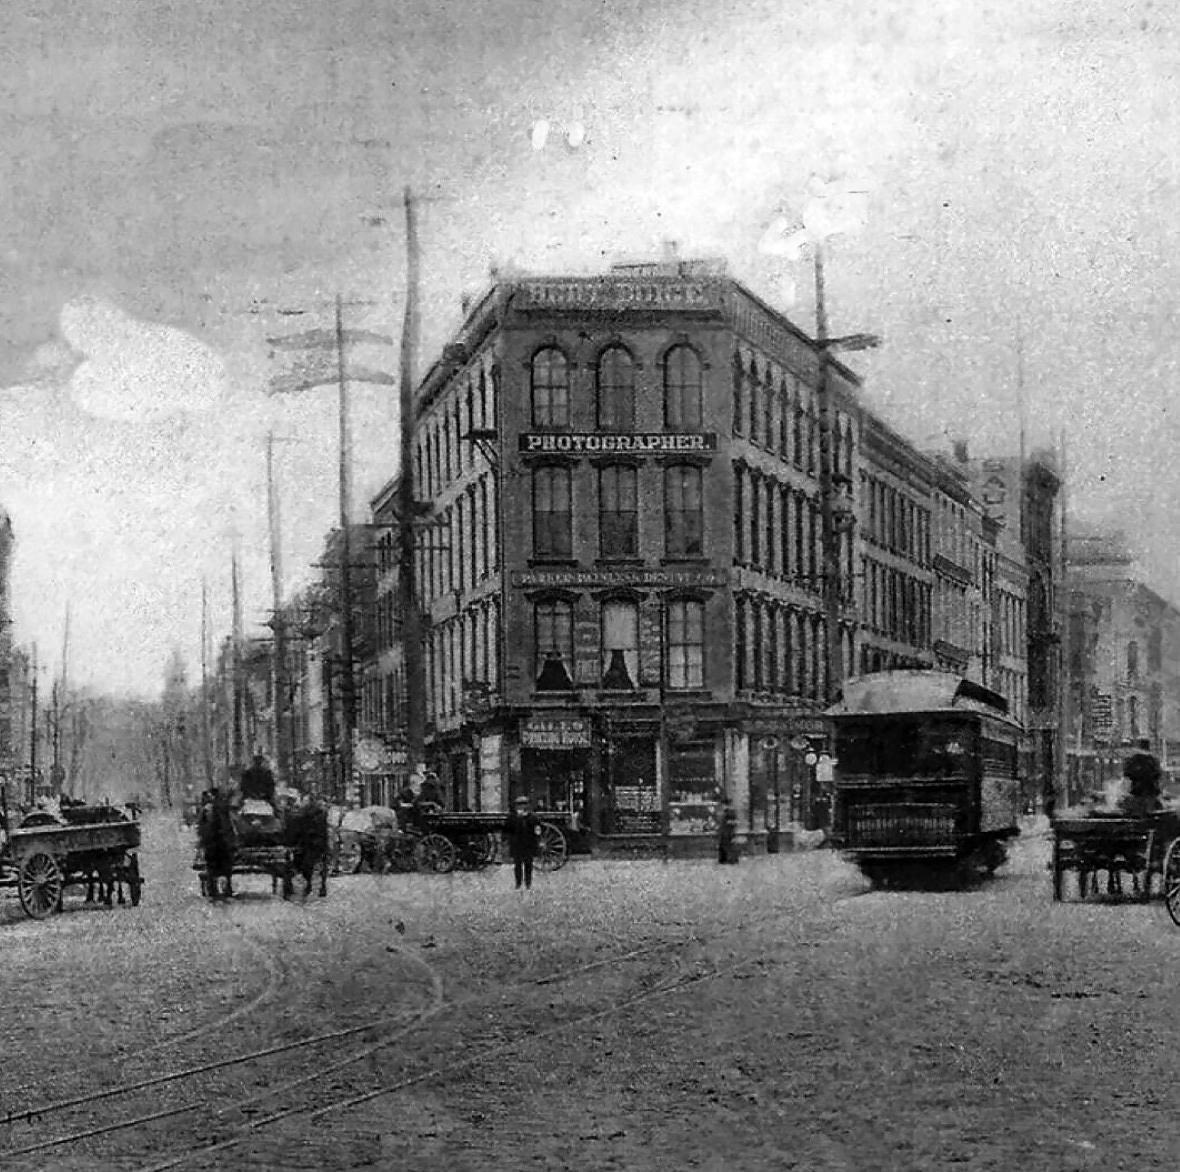 Franklin Square in Troy, NY c1910